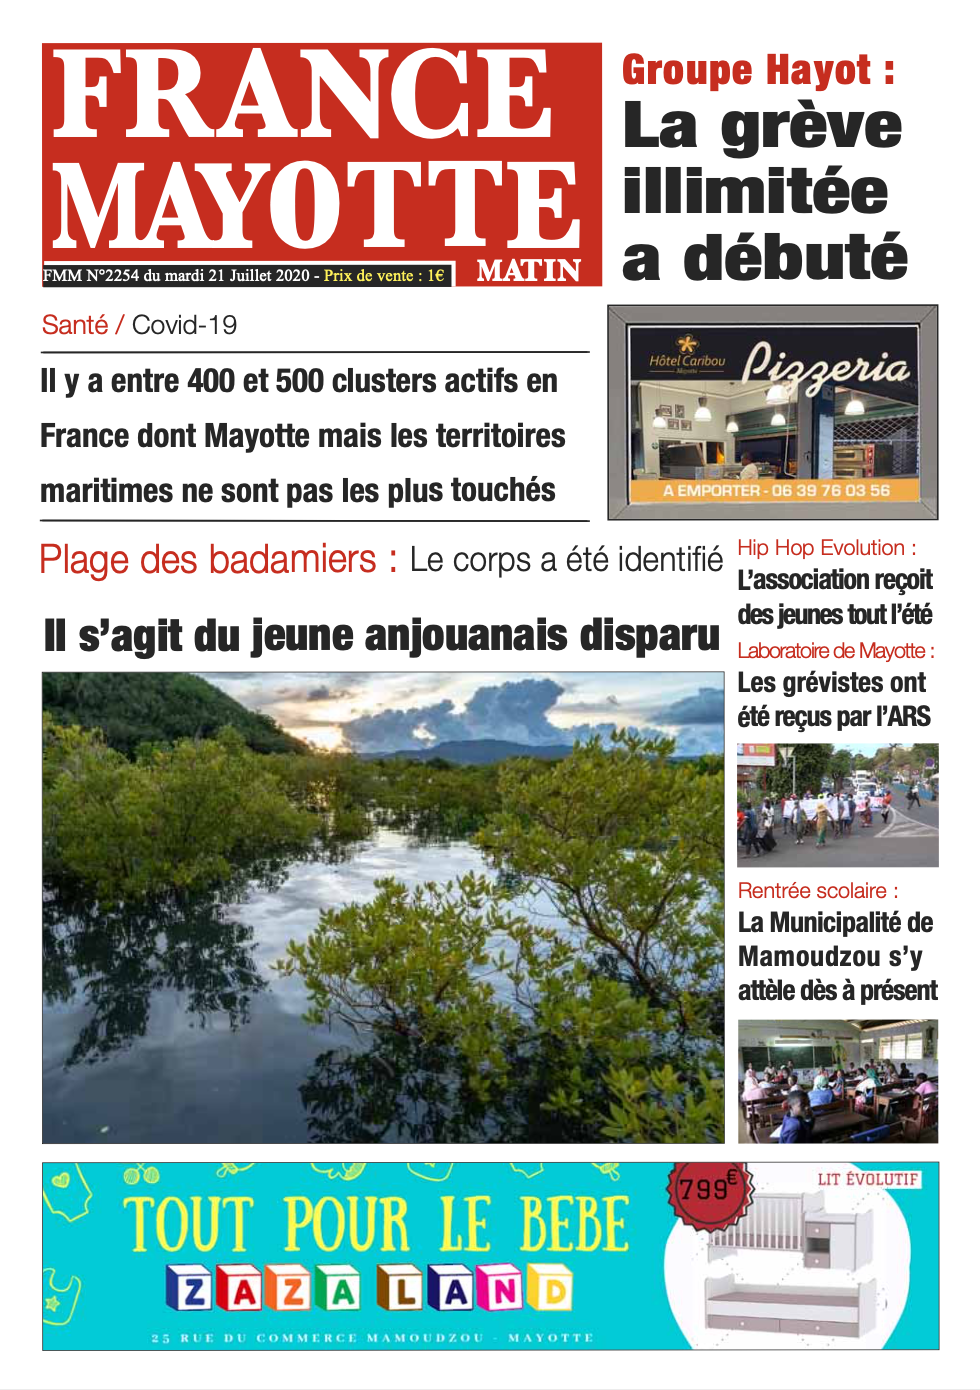 France Mayotte Mardi 21 juillet 2020